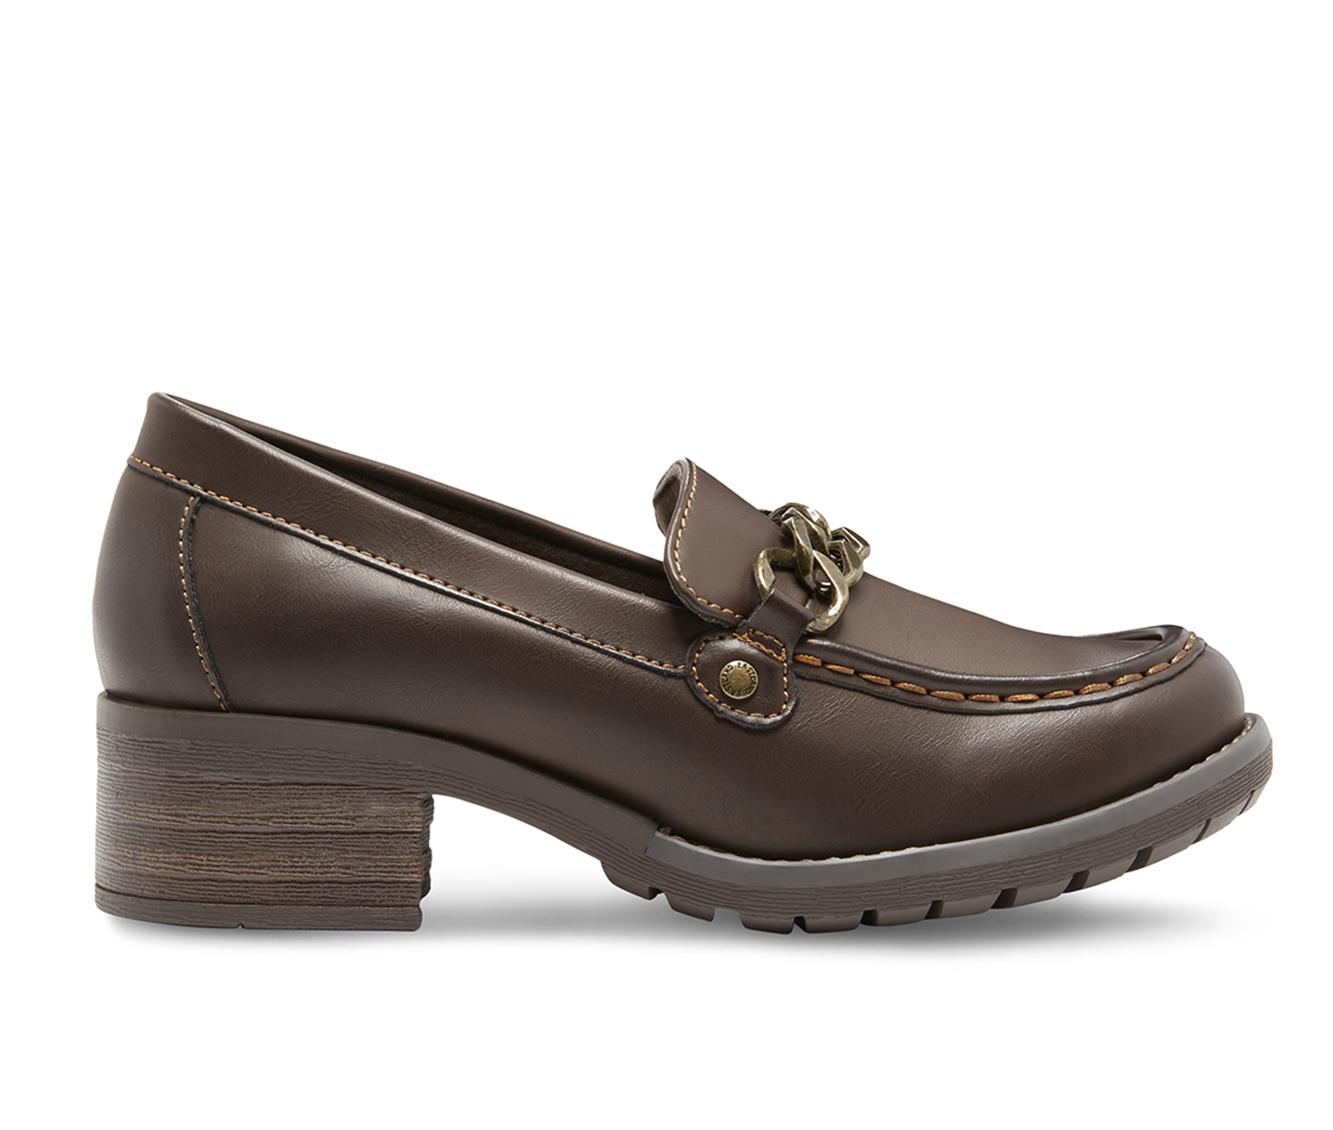 Eastland Nora Women's Shoe (Brown Faux Leather)